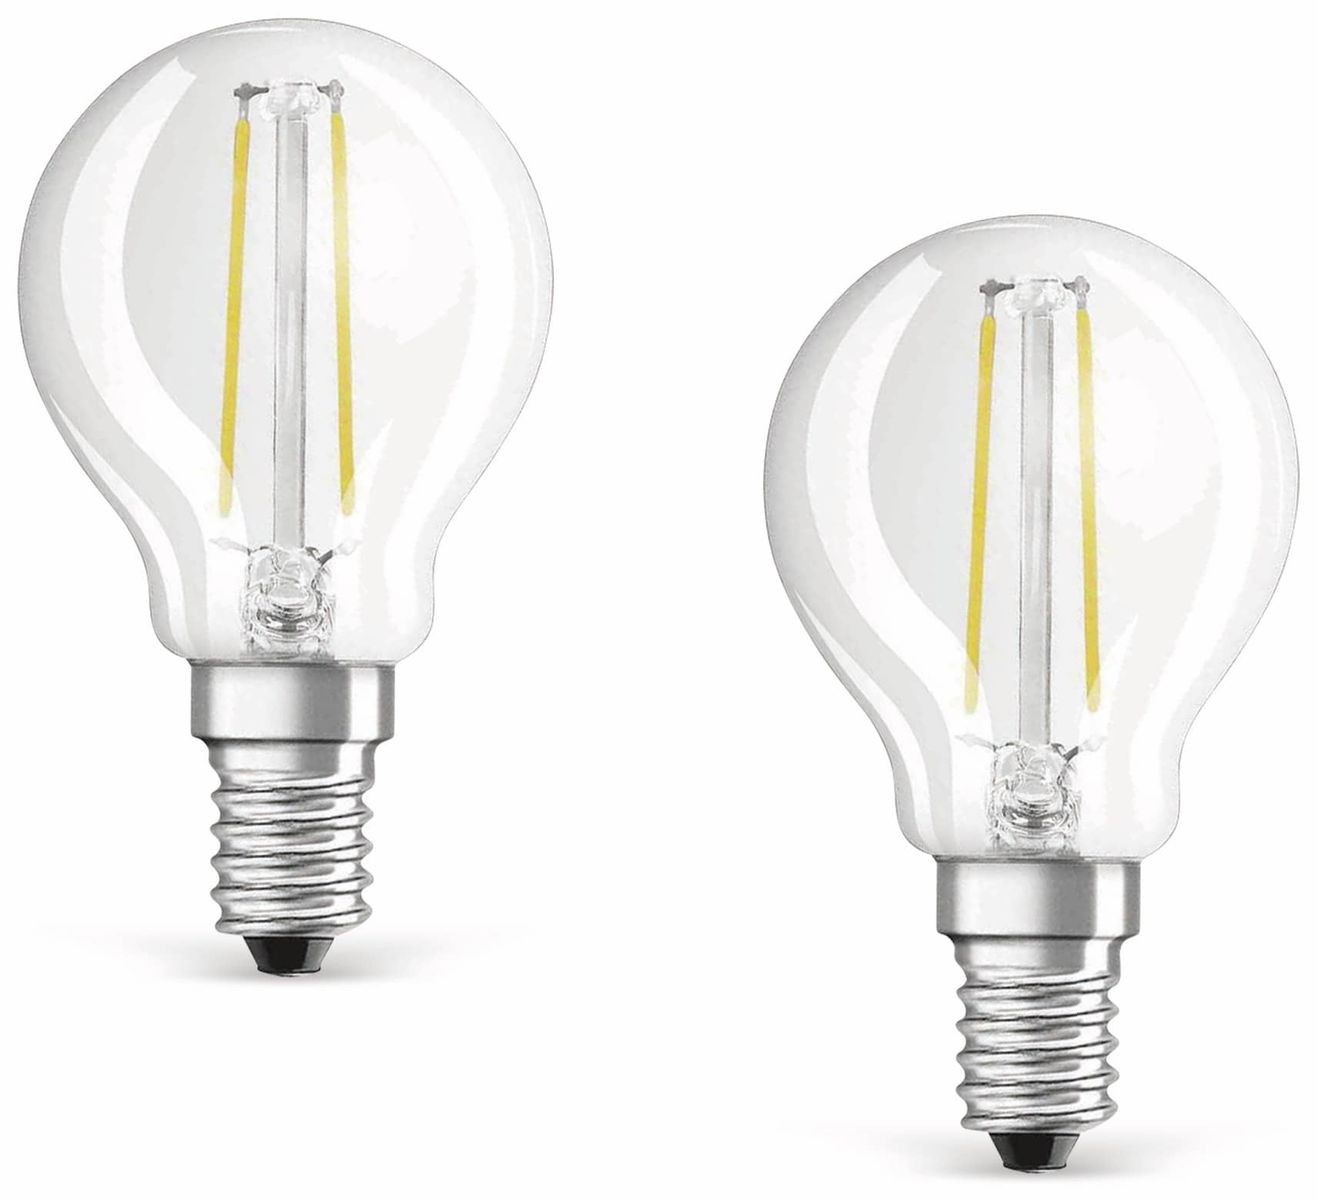 led lampe osram base classic p e14 eek a 4 w 470 lm 2700 k 2 st ck online kaufen. Black Bedroom Furniture Sets. Home Design Ideas